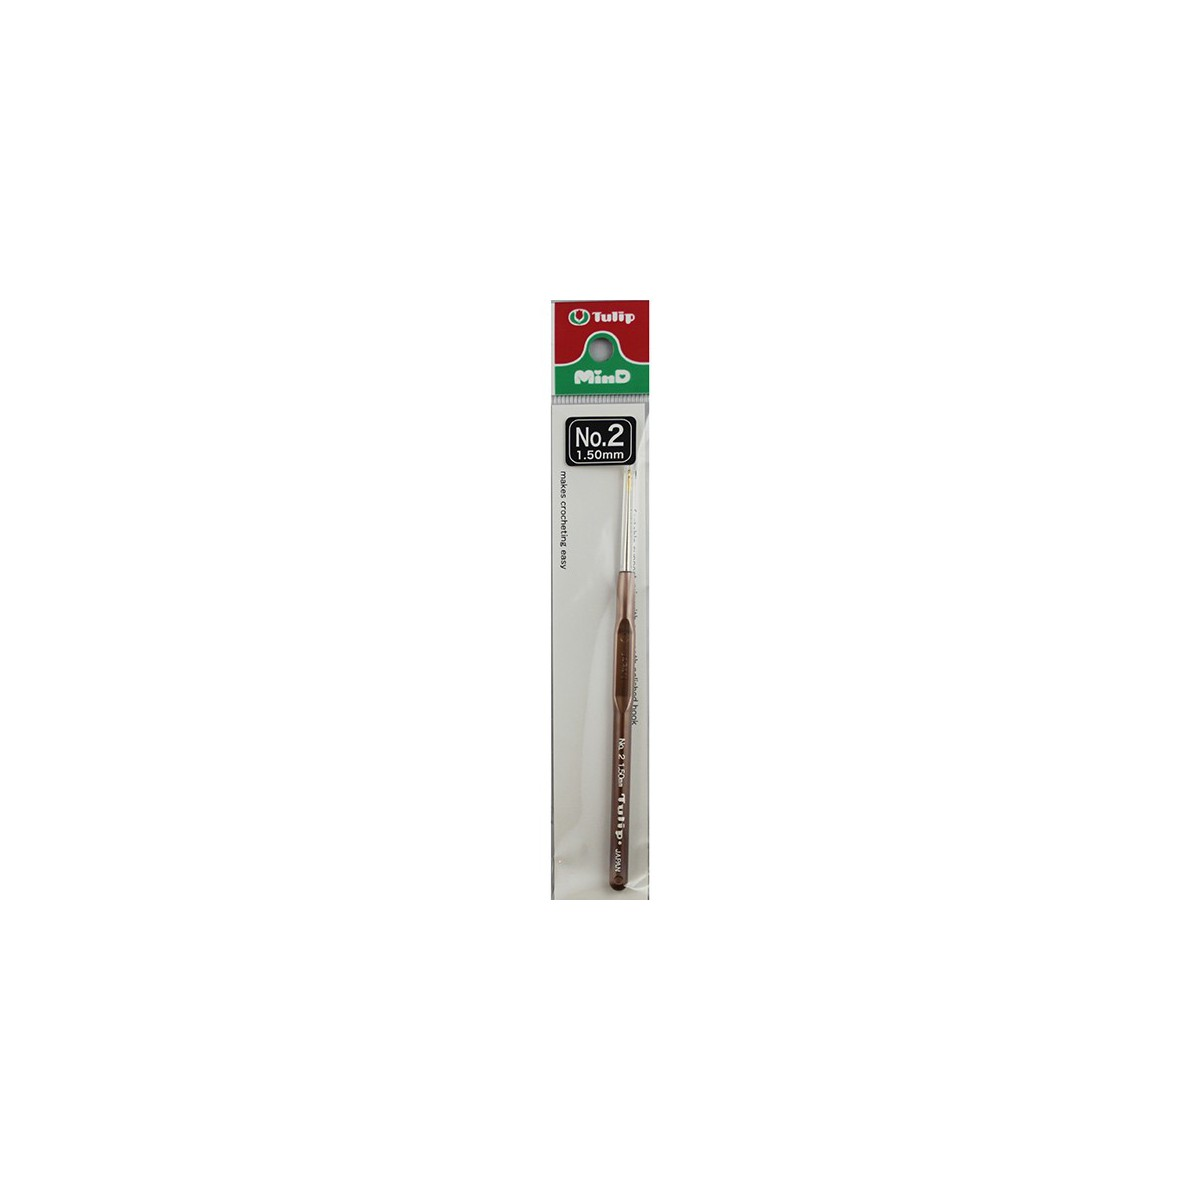 Uncinetto Tulip 1,50mm - n°2